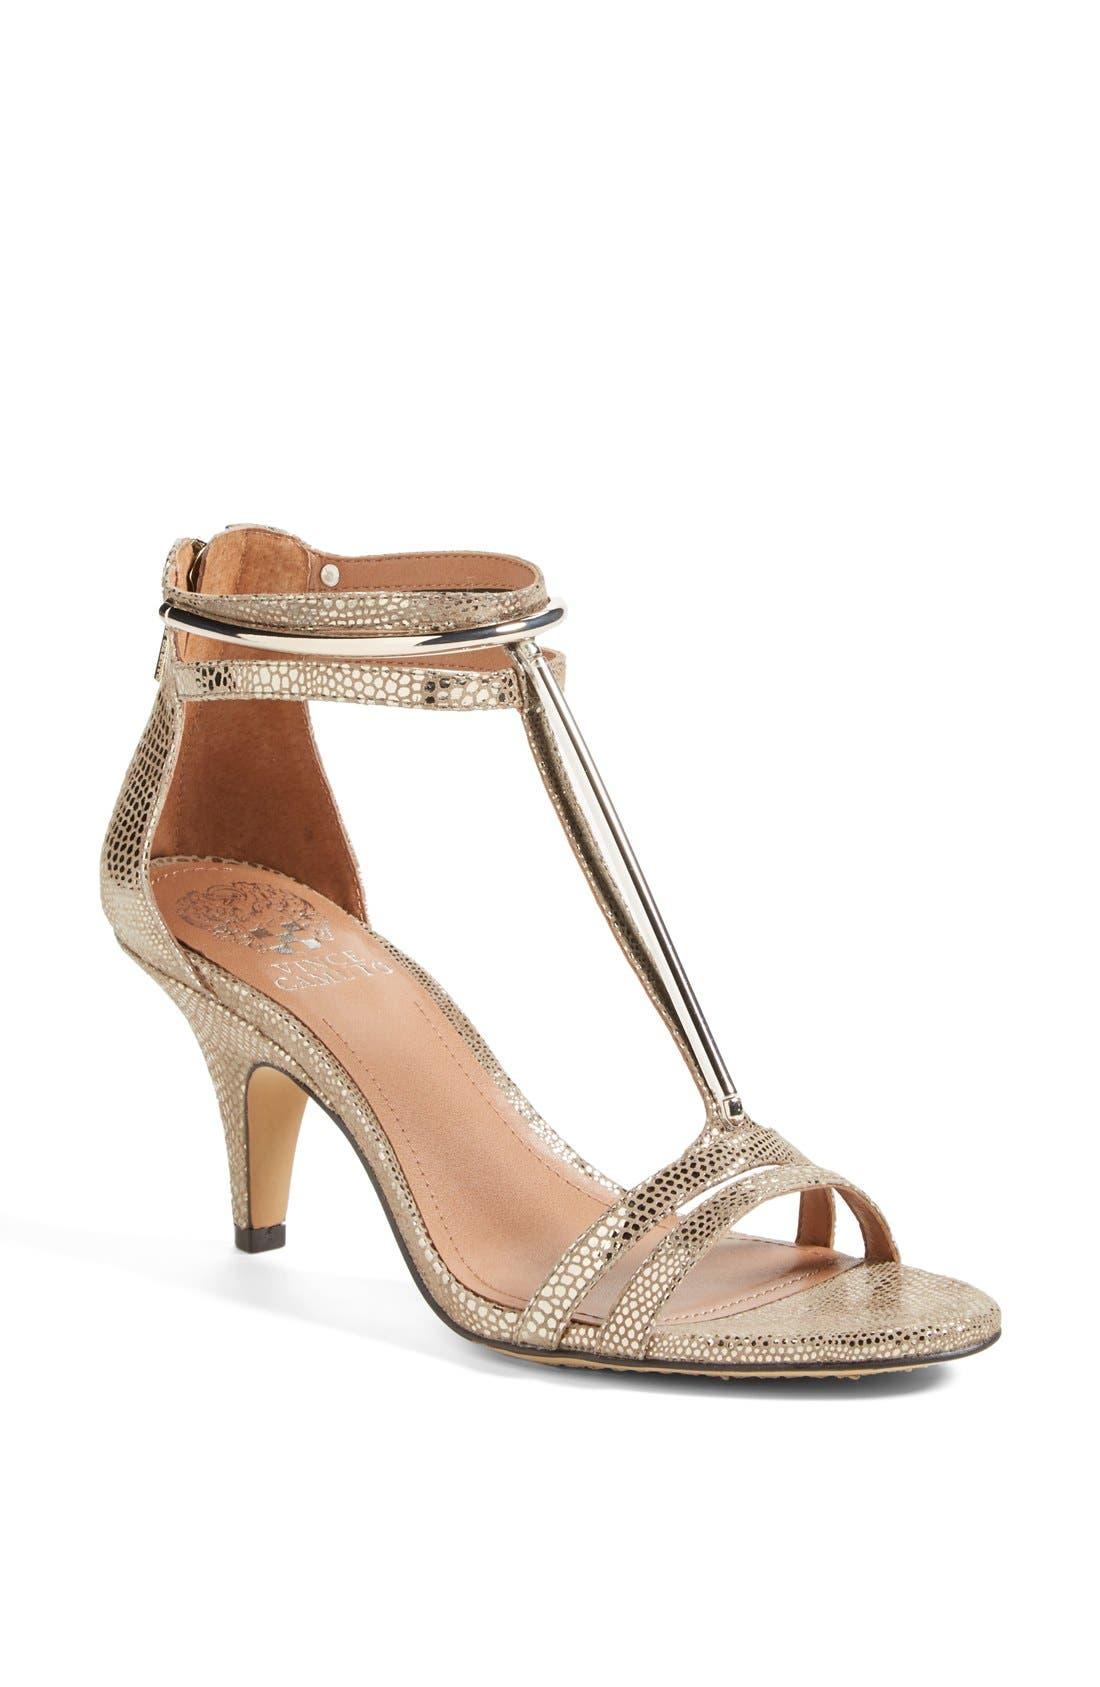 Alternate Image 1 Selected - Vince Camuto 'Mitzy' Metallic T-Strap Sandal (Women)